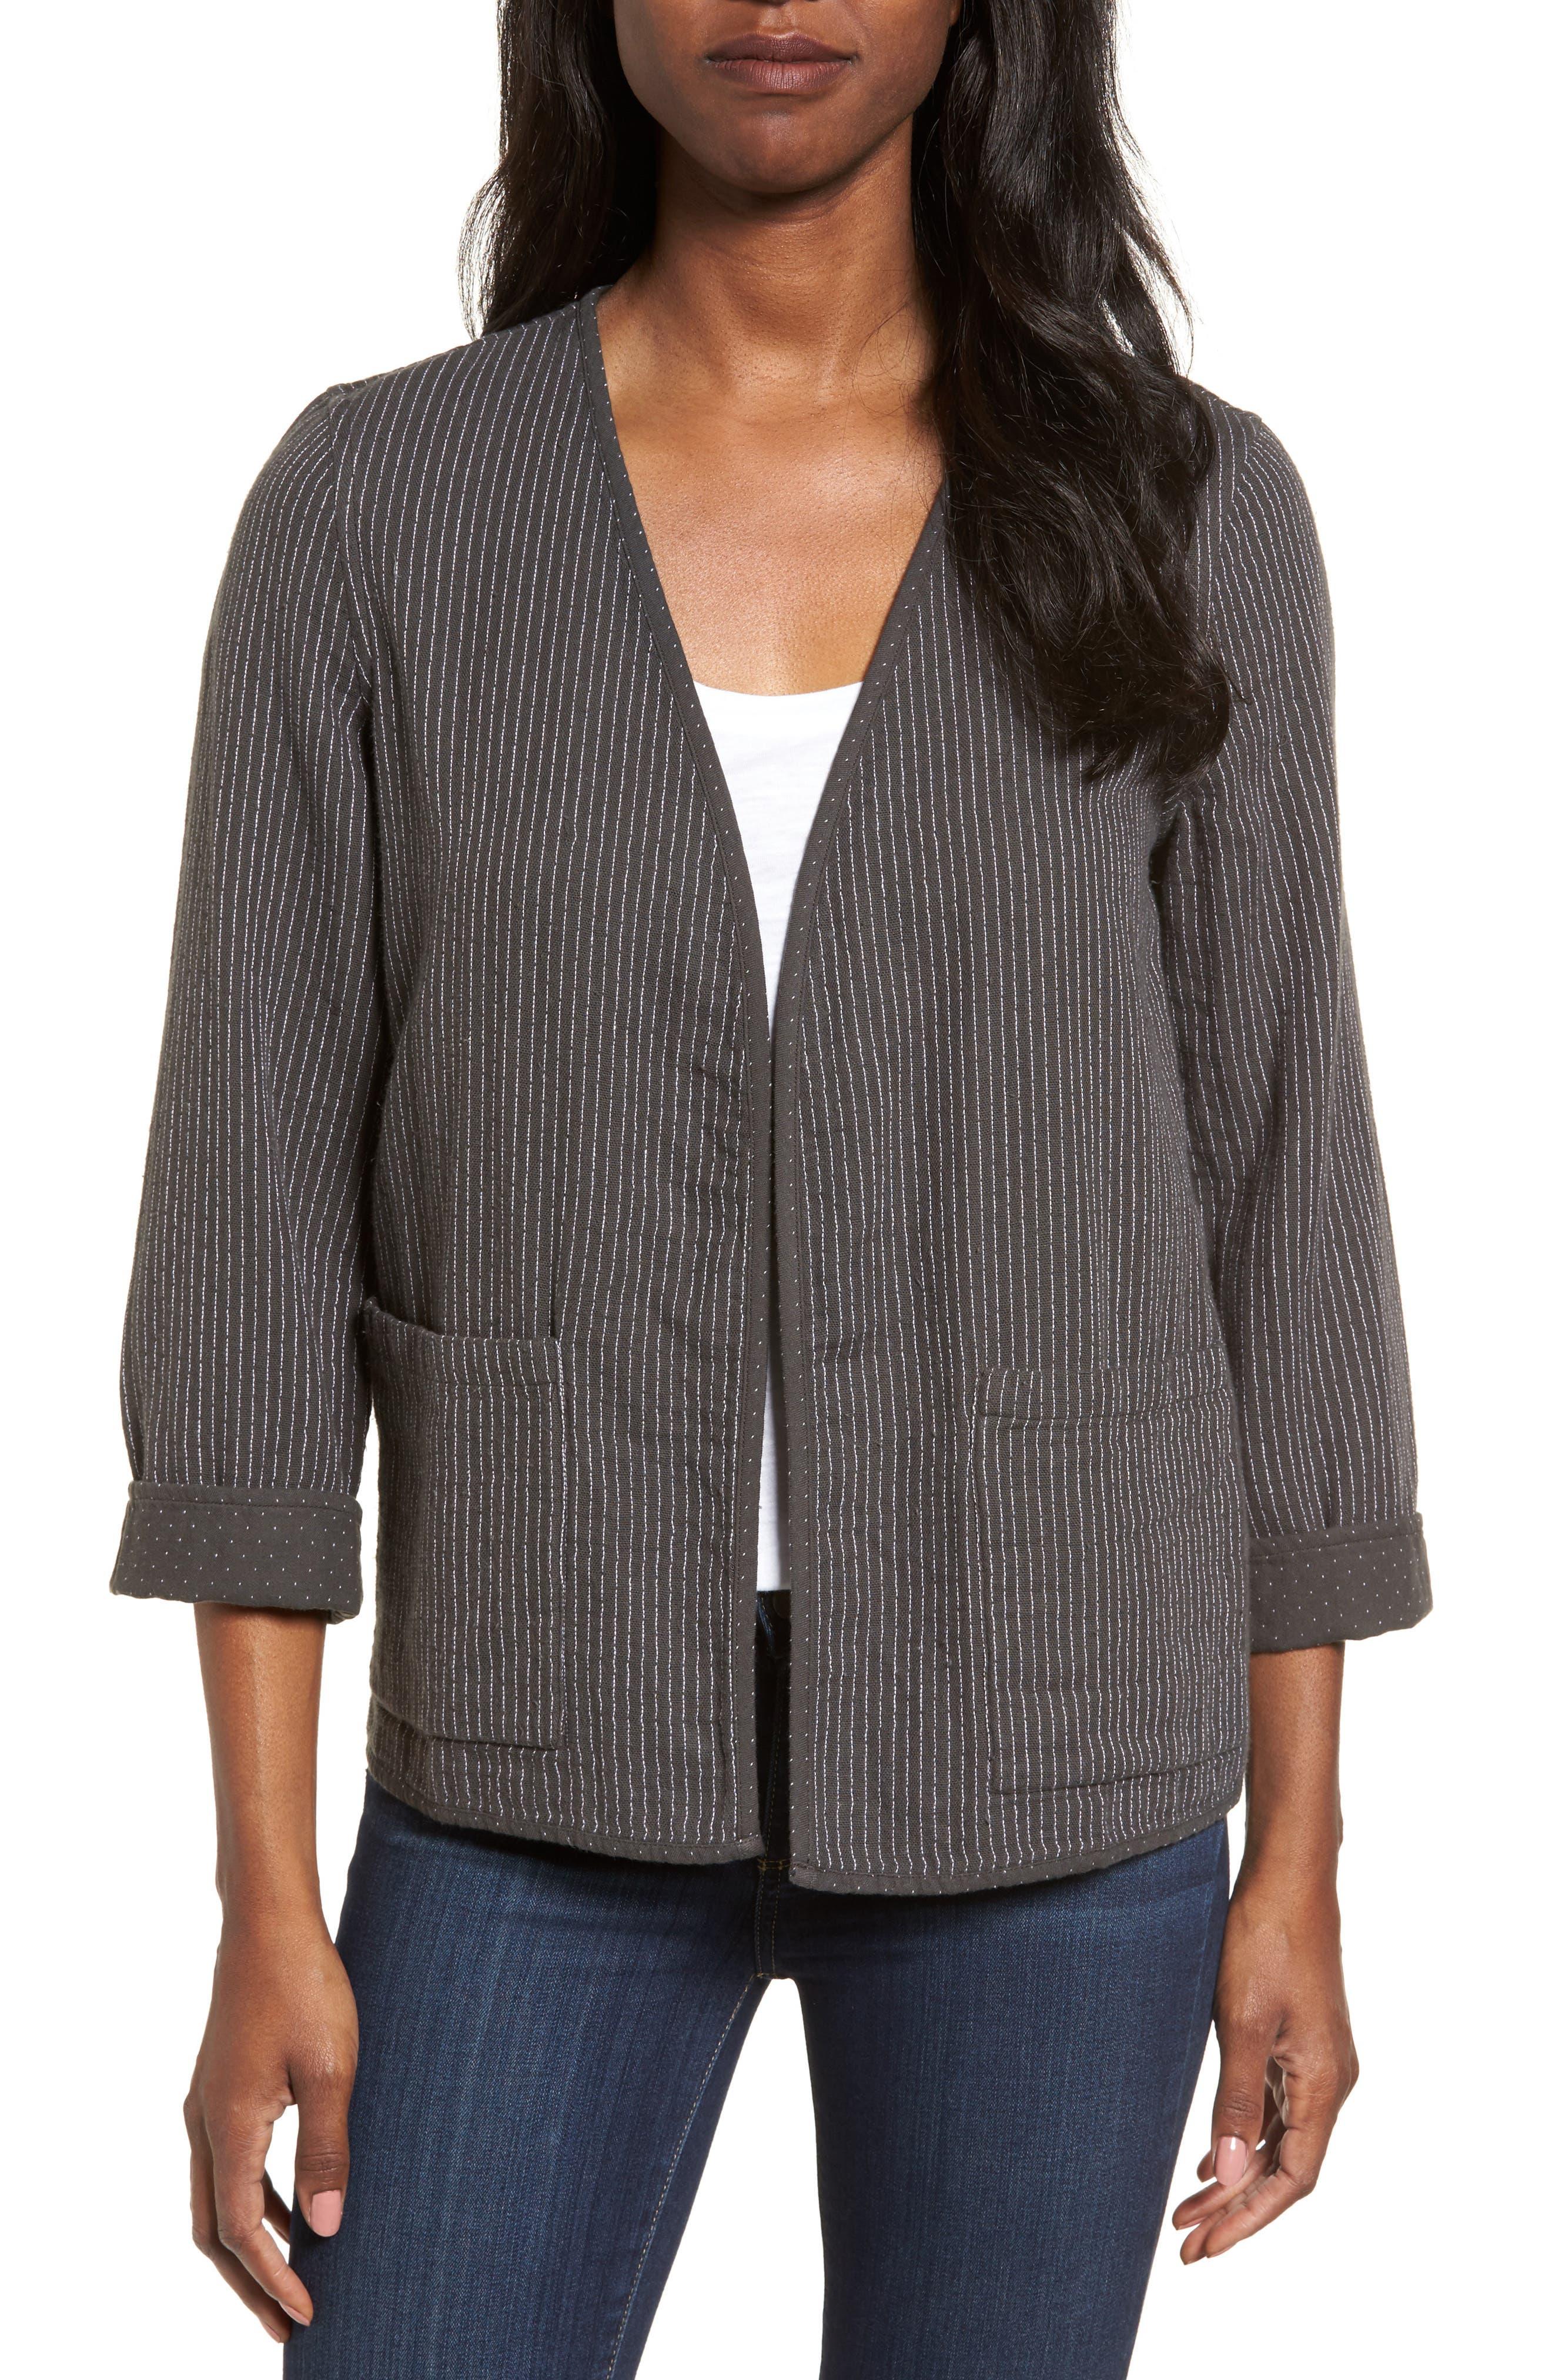 Alternate Image 1 Selected - Eileen Fisher Reversible Organic Cotton Jacket